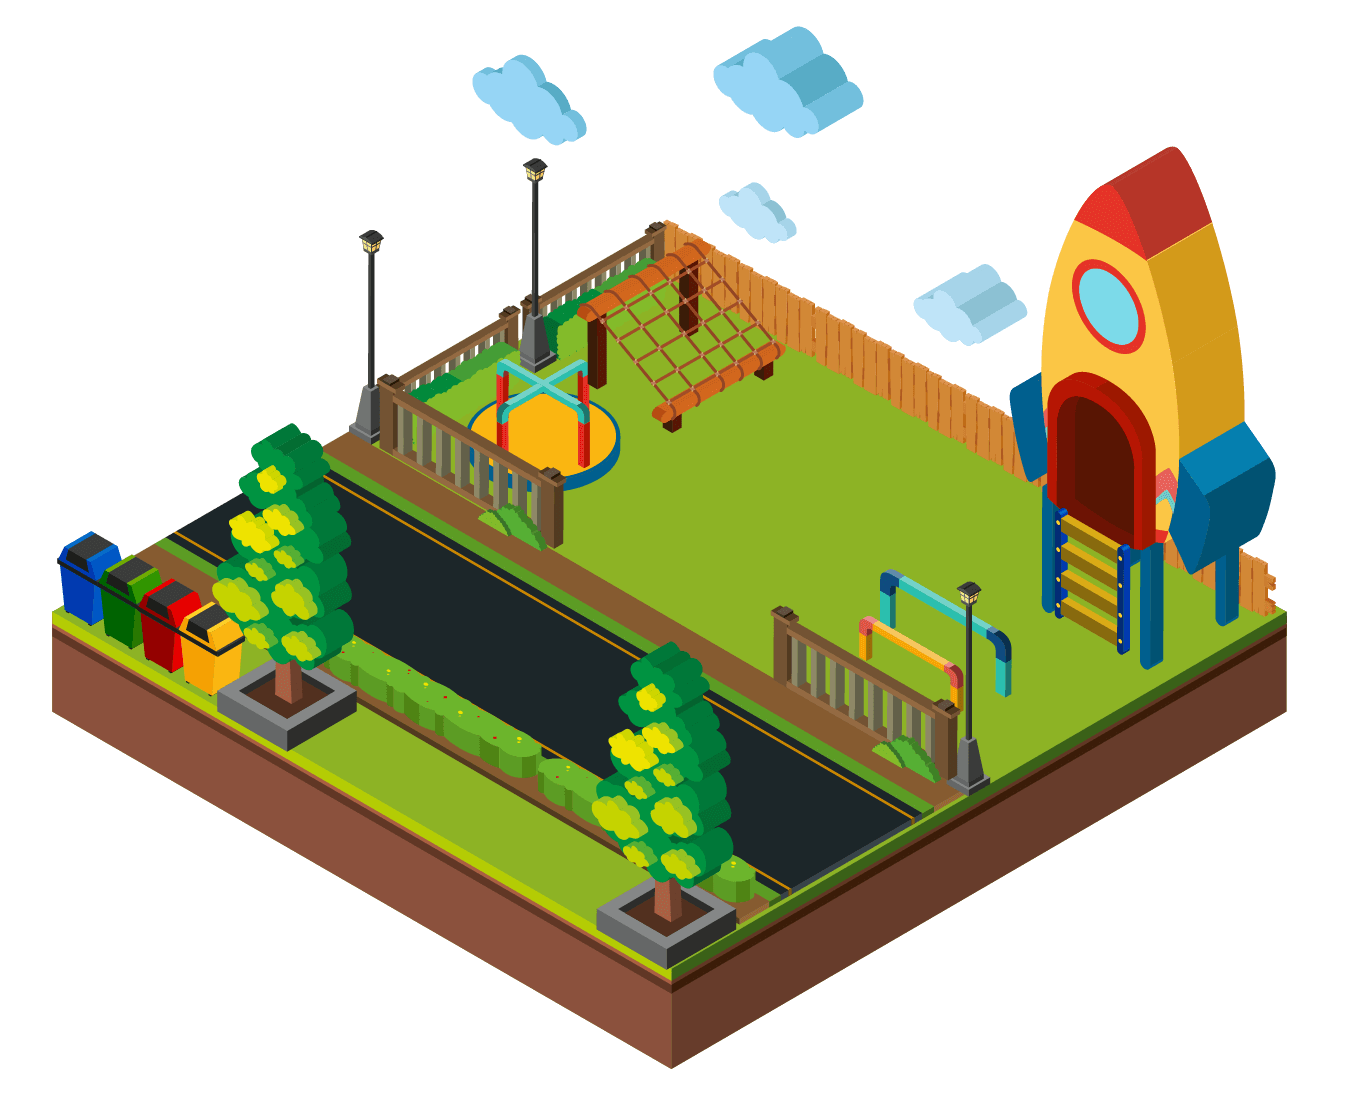 Square-shaped park